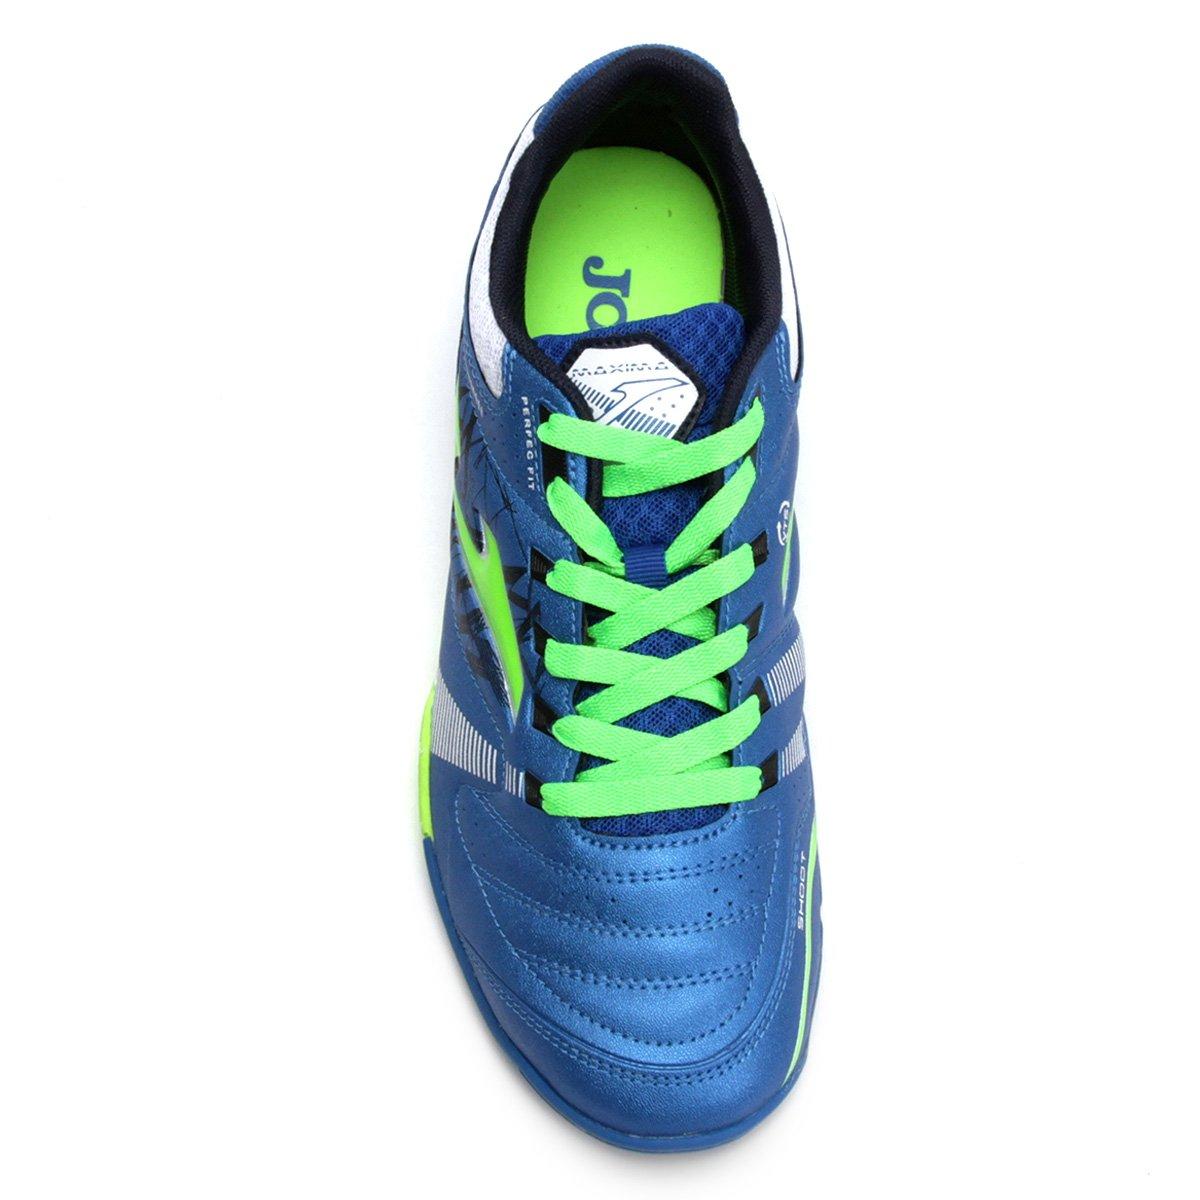 Chuteira Society Joma Maxima TF Masculina - Azul - Compre Agora ... a18f61c91bb4a